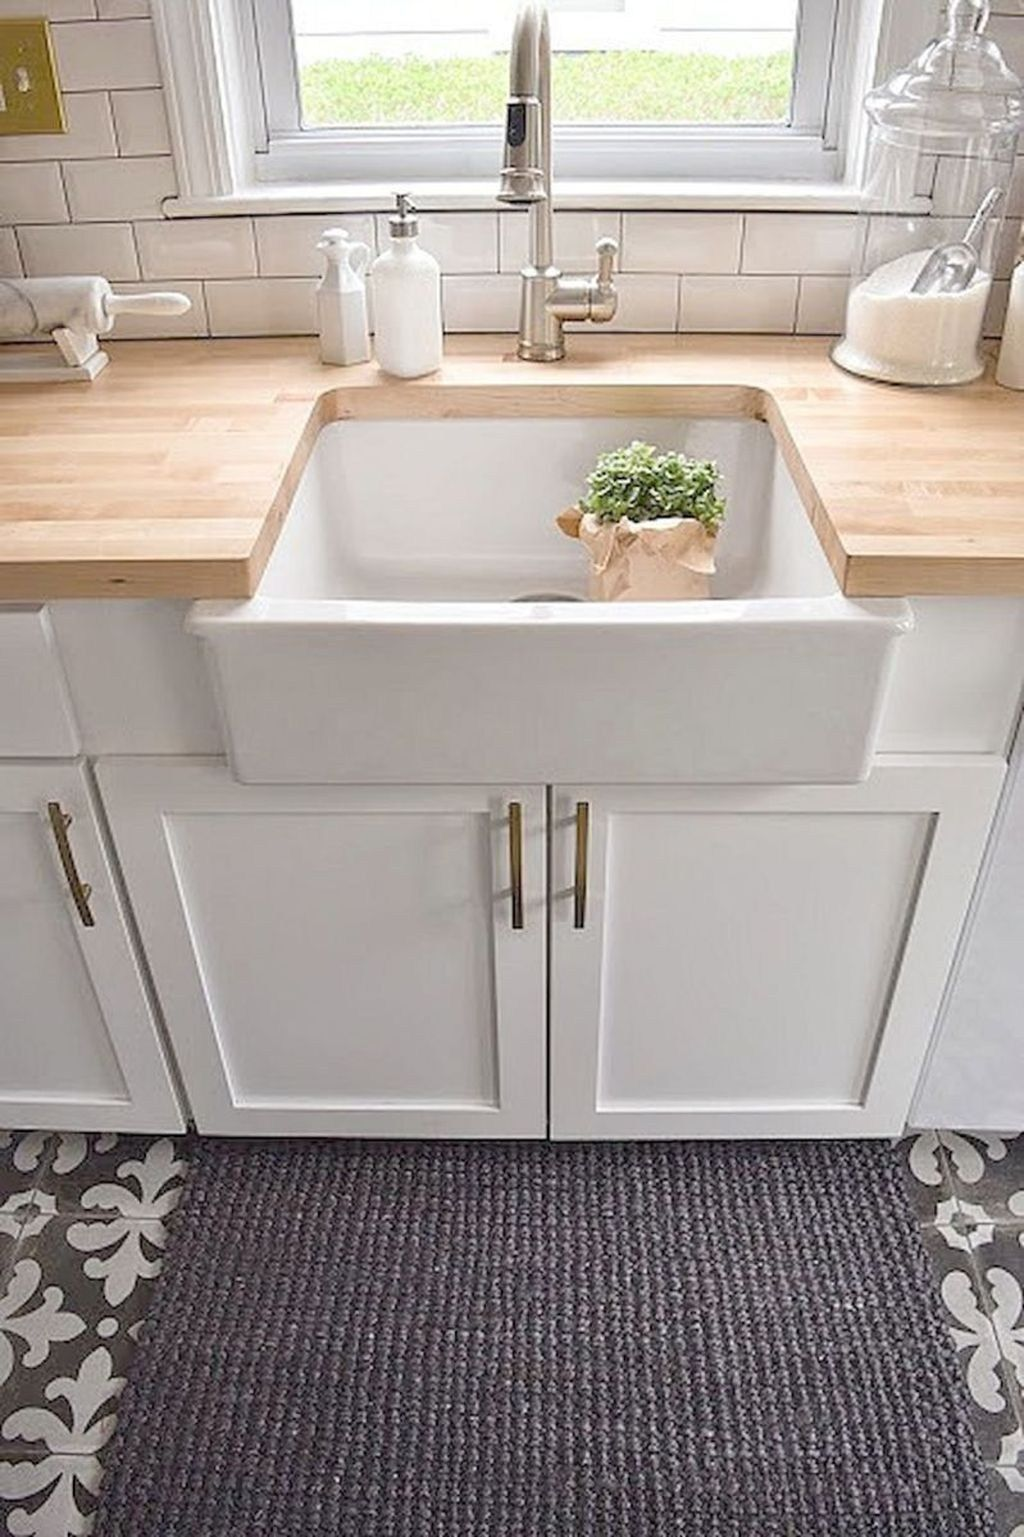 32 stunning rustic farmhouse kitchen decor ideas stylish kitchen ikea farm sink butcher on farmhouse kitchen decor countertop id=26588